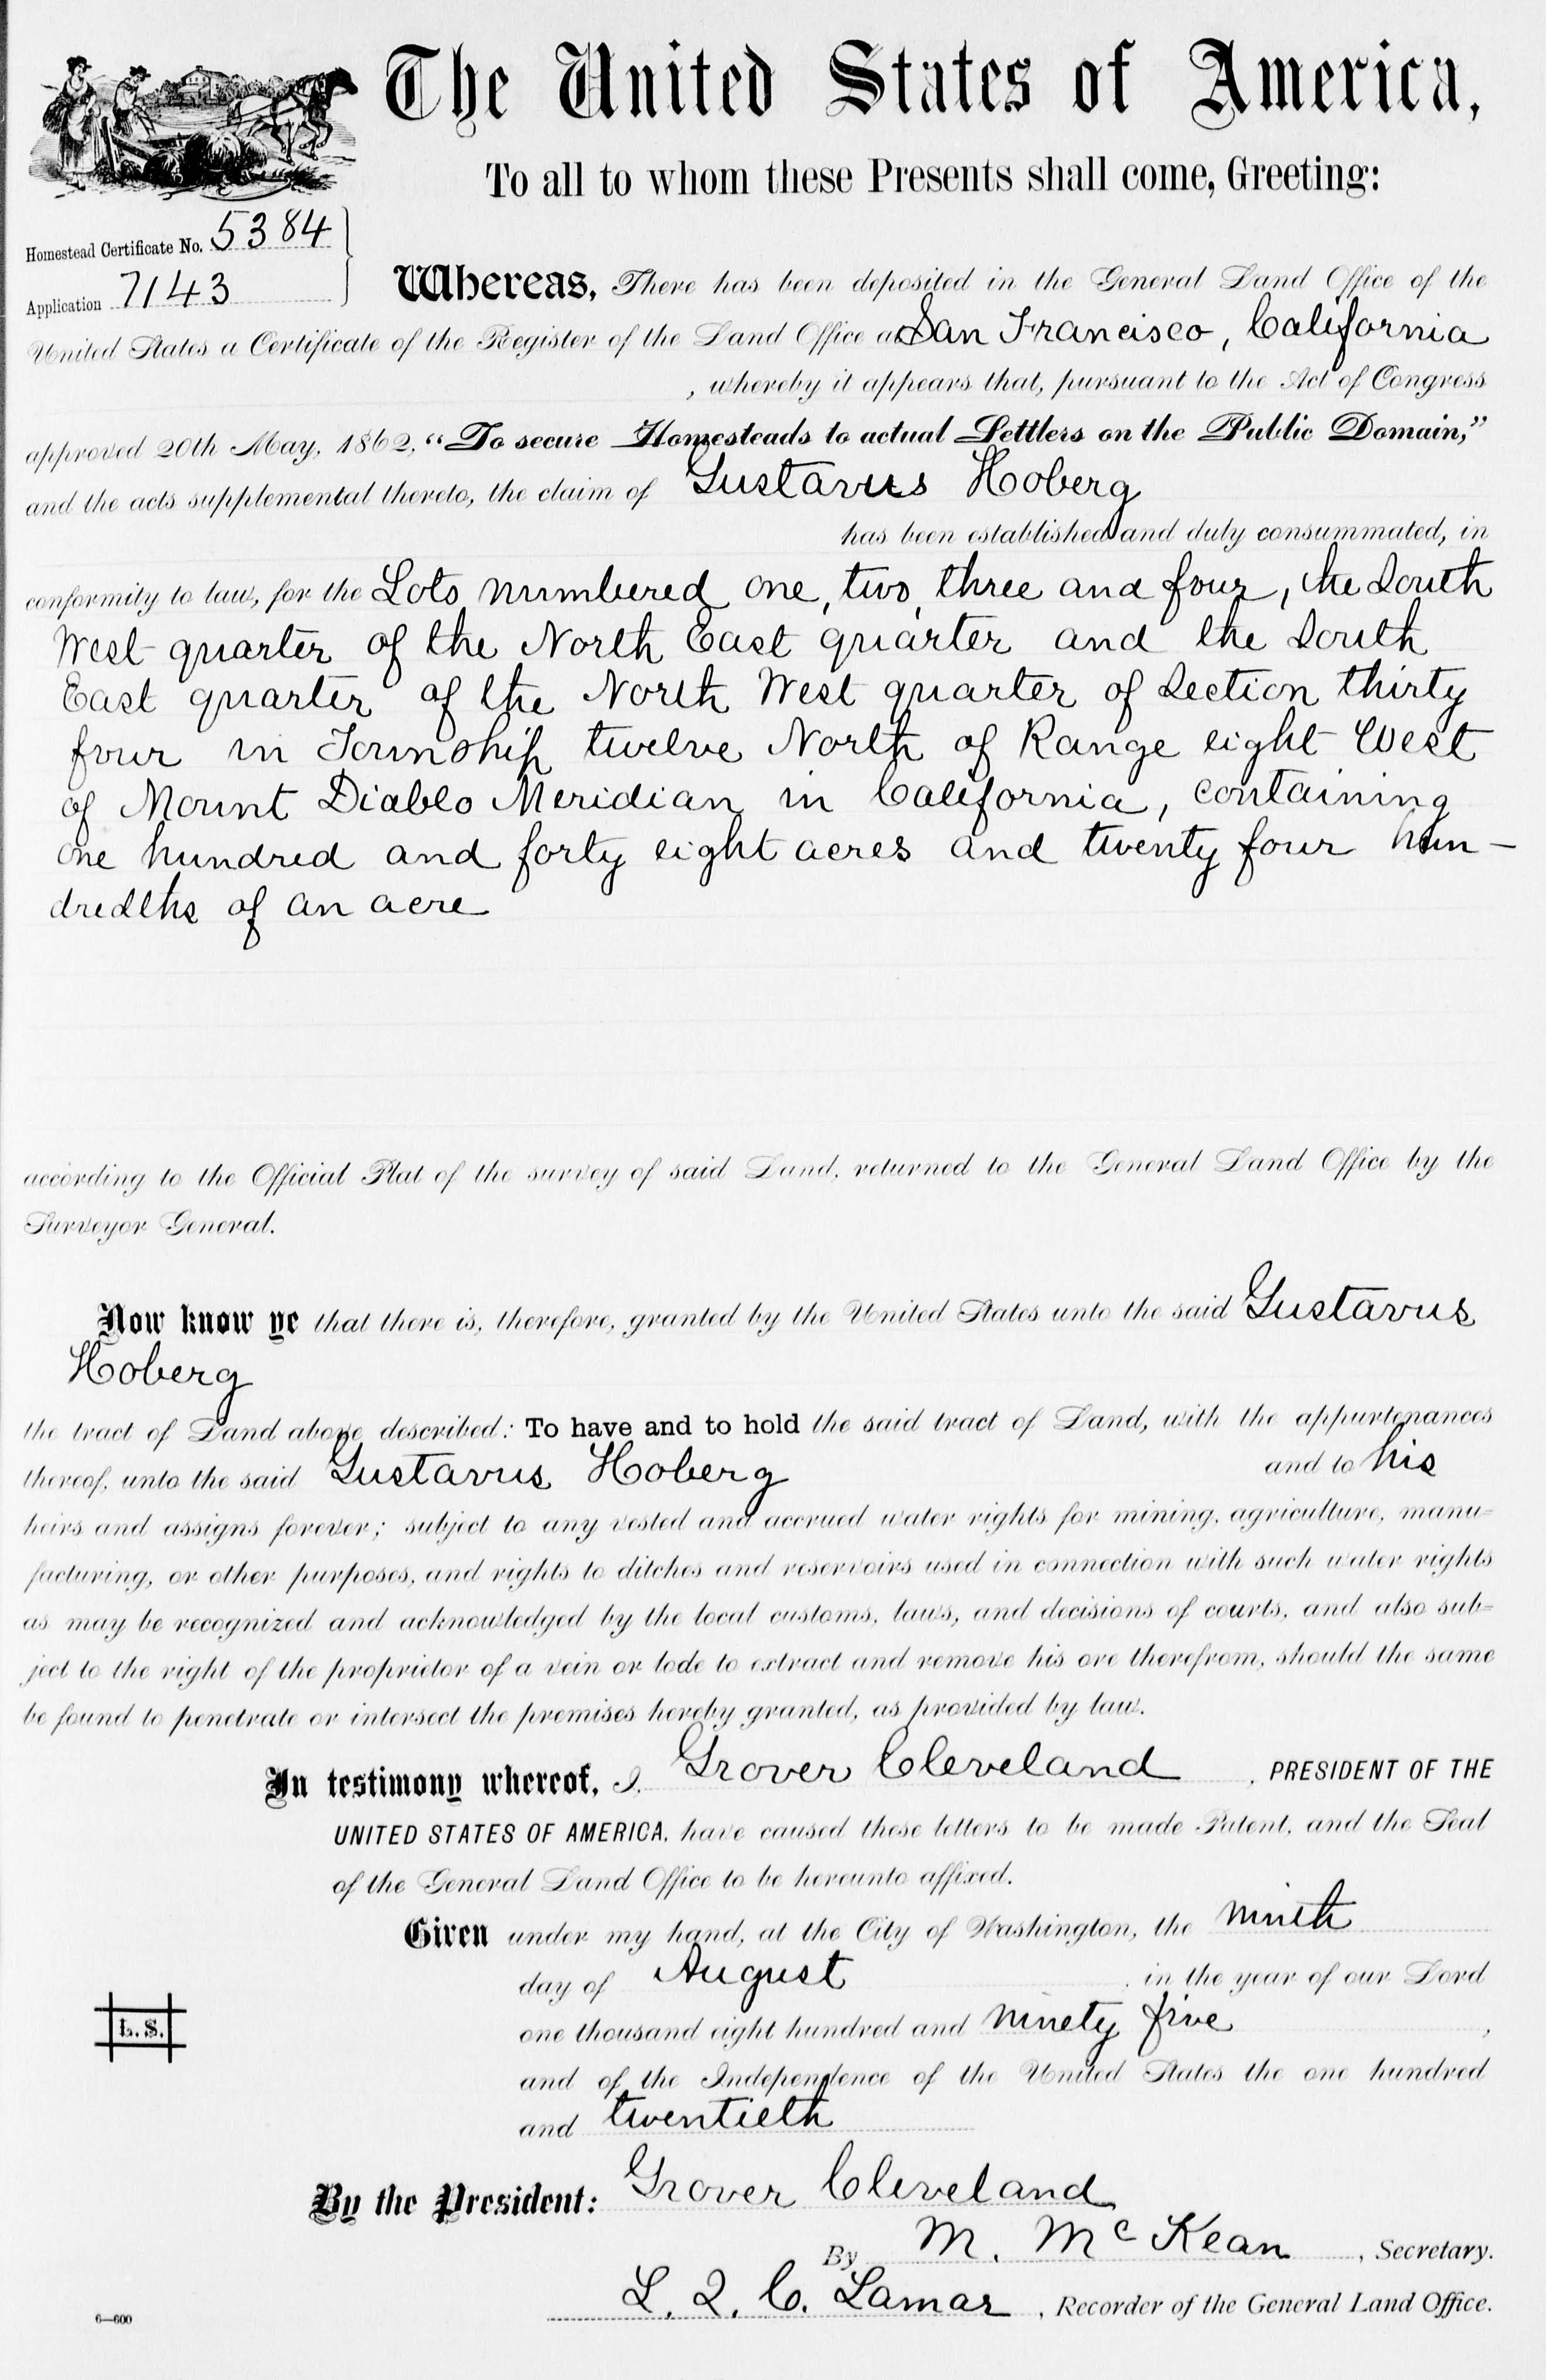 1895LandPatent